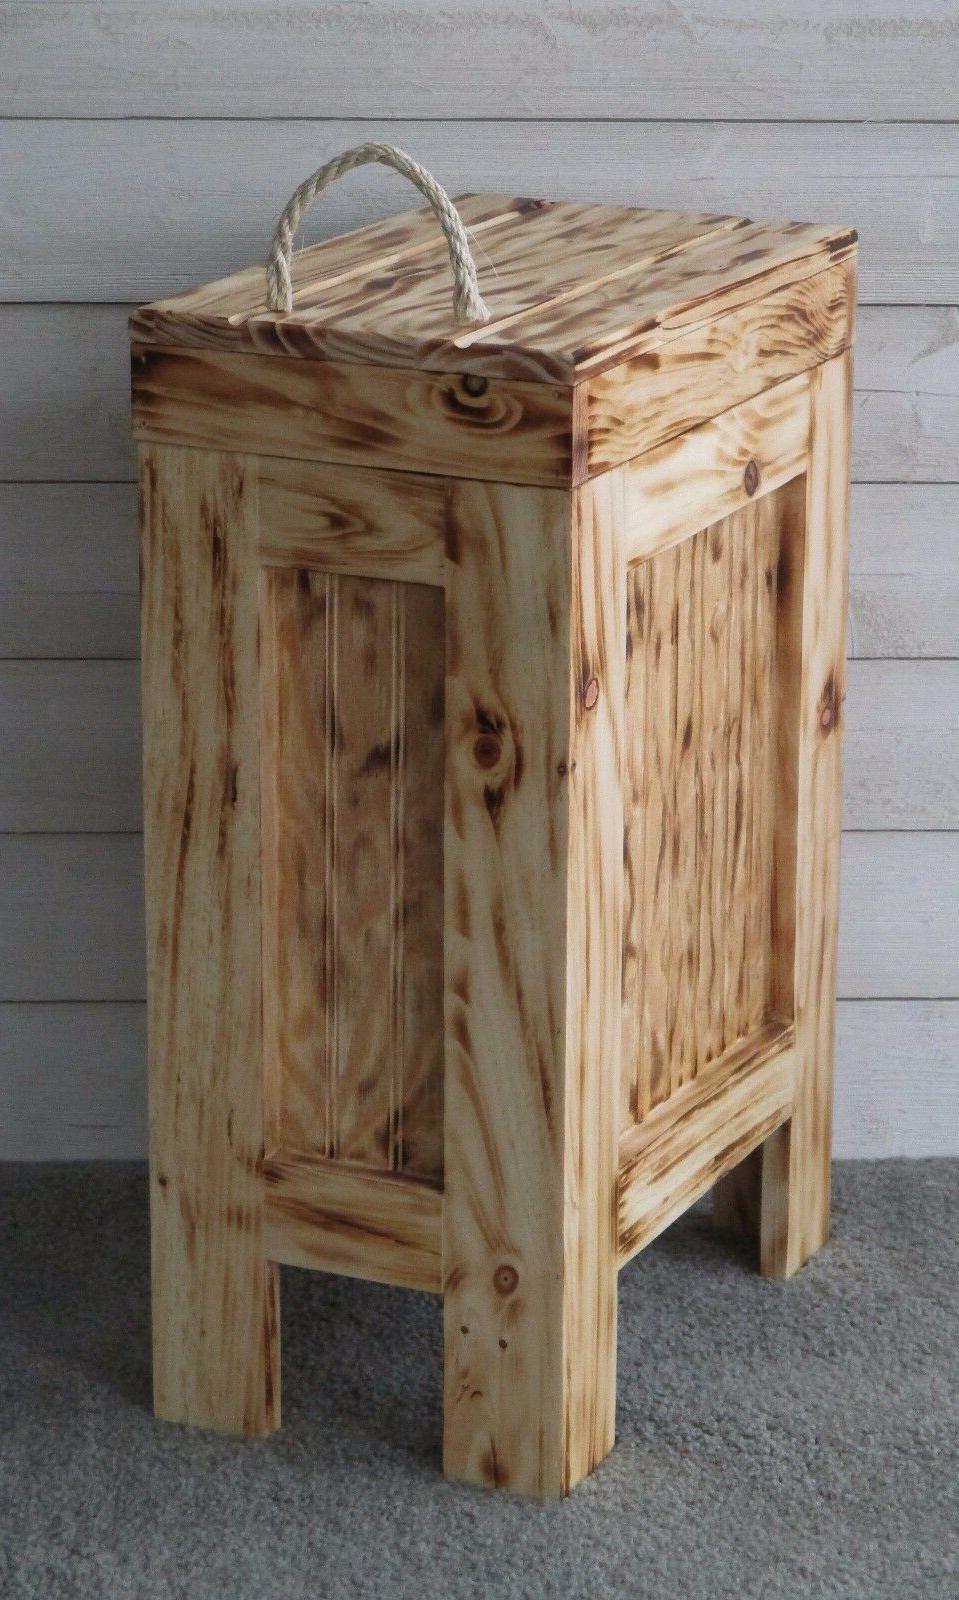 Wood Can Garbage Trash Bin w/